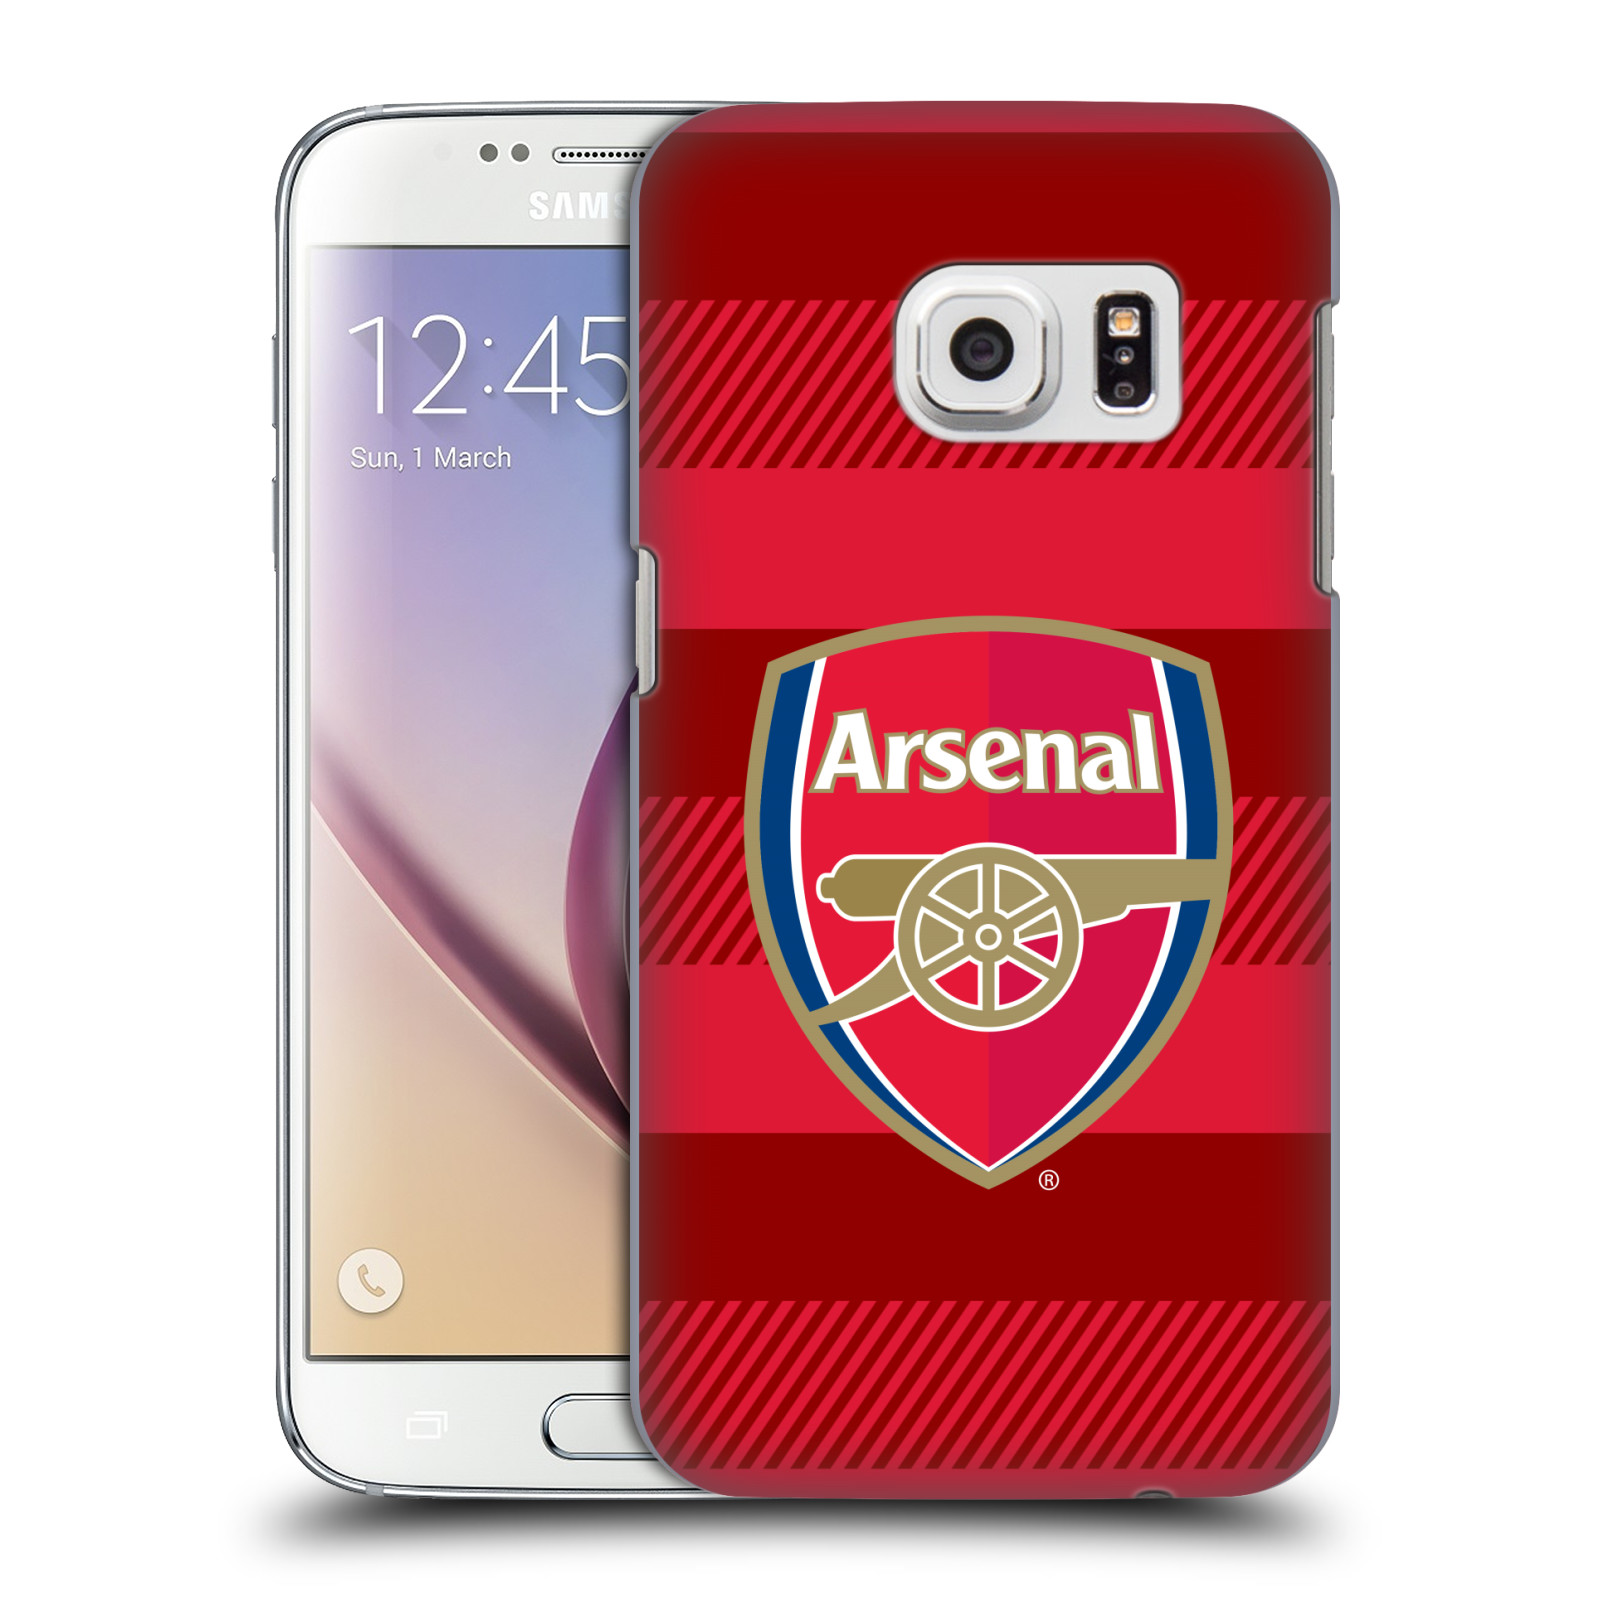 Plastové pouzdro na mobil Samsung Galaxy S7 - Head Case - Arsenal FC - Logo s pruhy